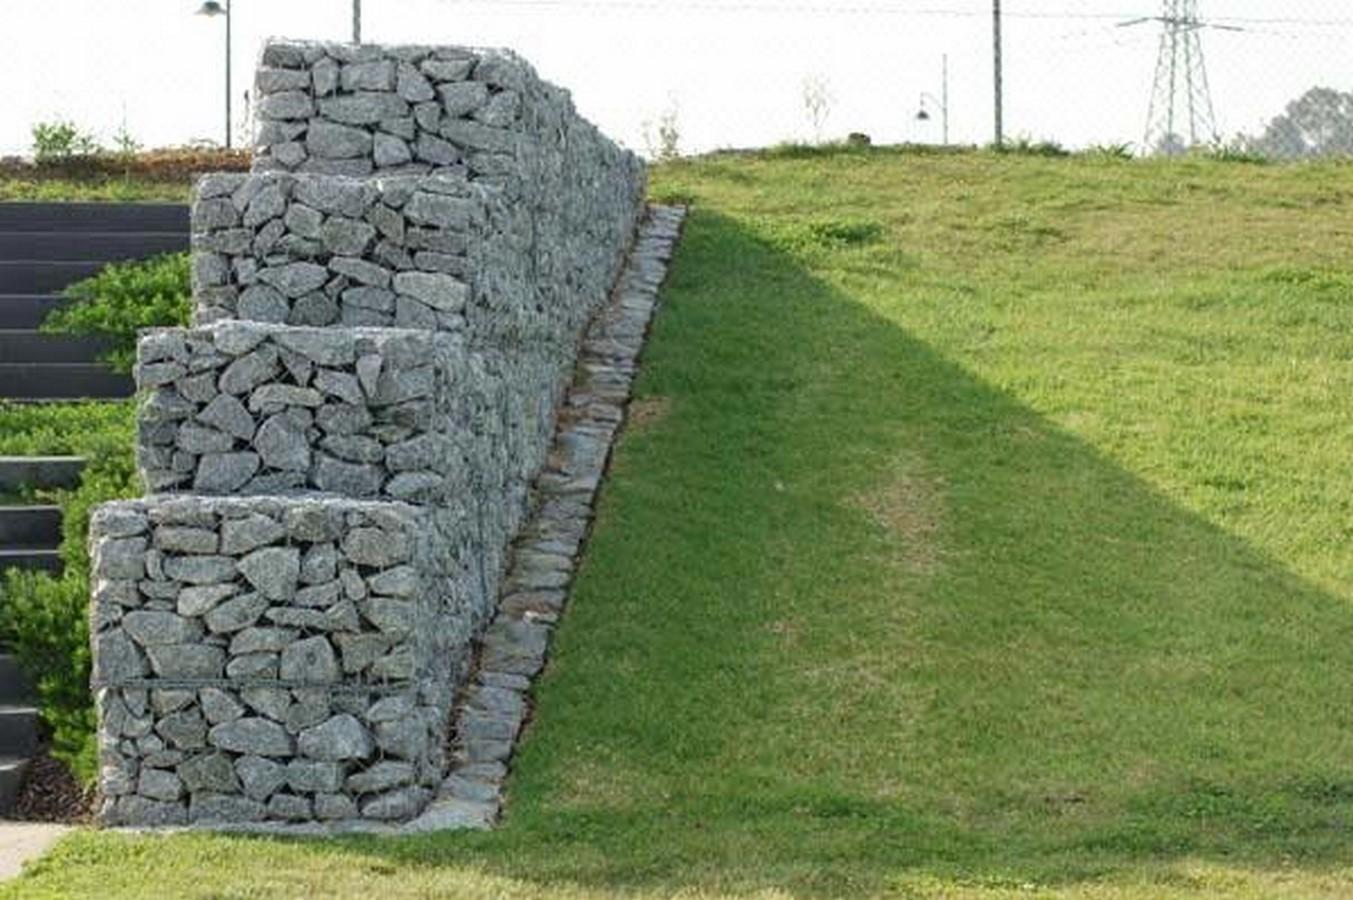 Gabion wall as a building technique - Sheet1